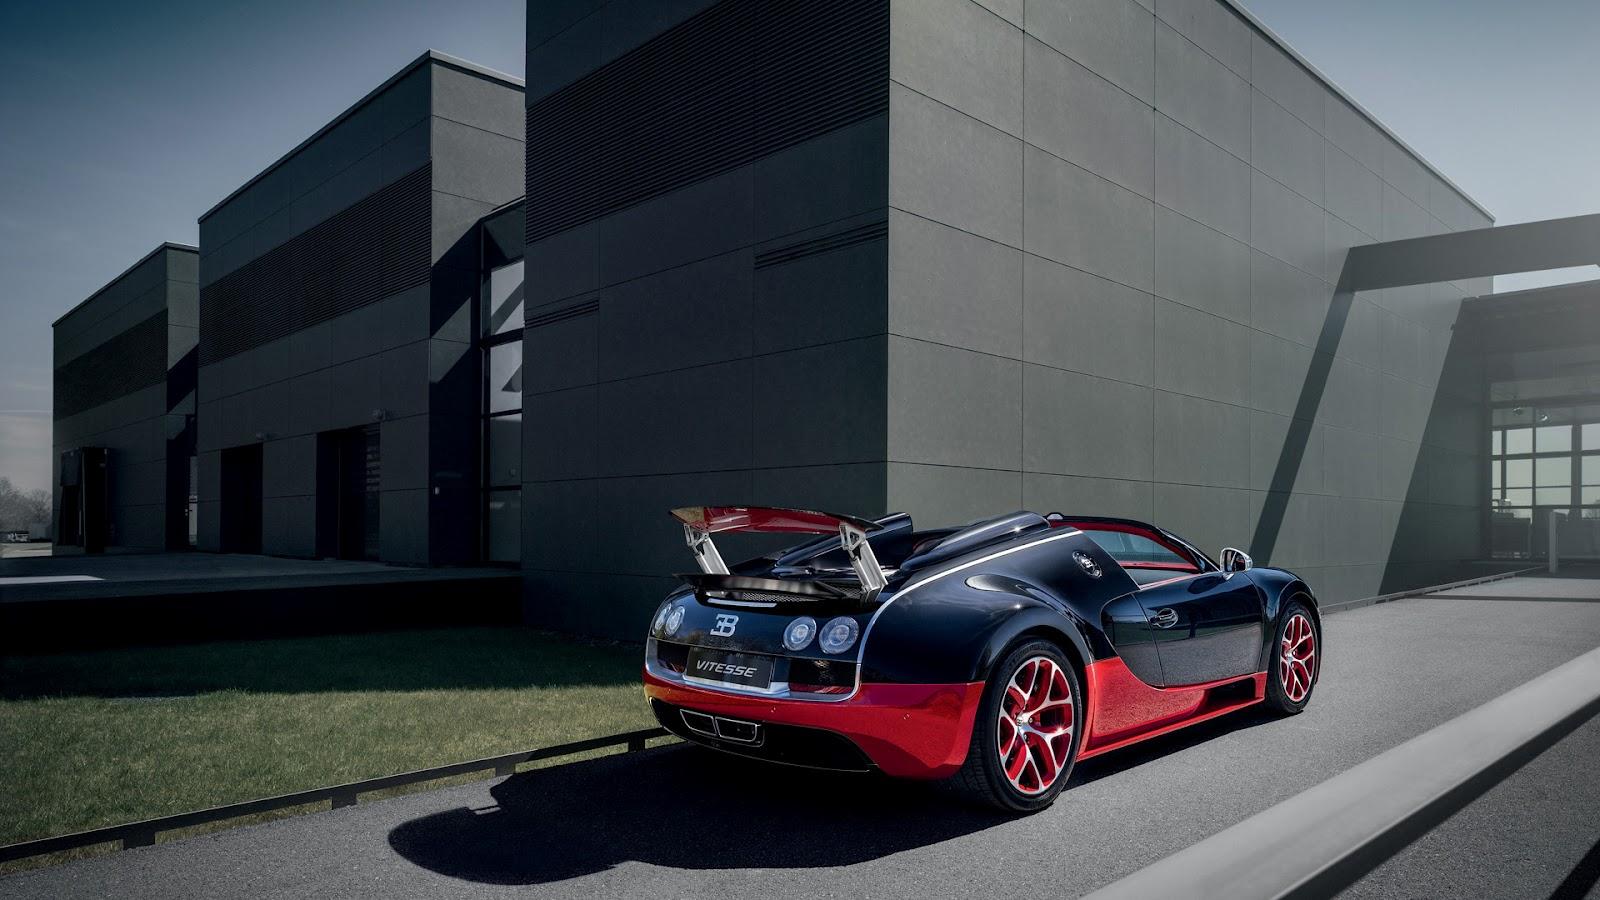 2012 bugatti veyron grand sport vitesse black red 8 0 w16 quad turbo 12. Black Bedroom Furniture Sets. Home Design Ideas